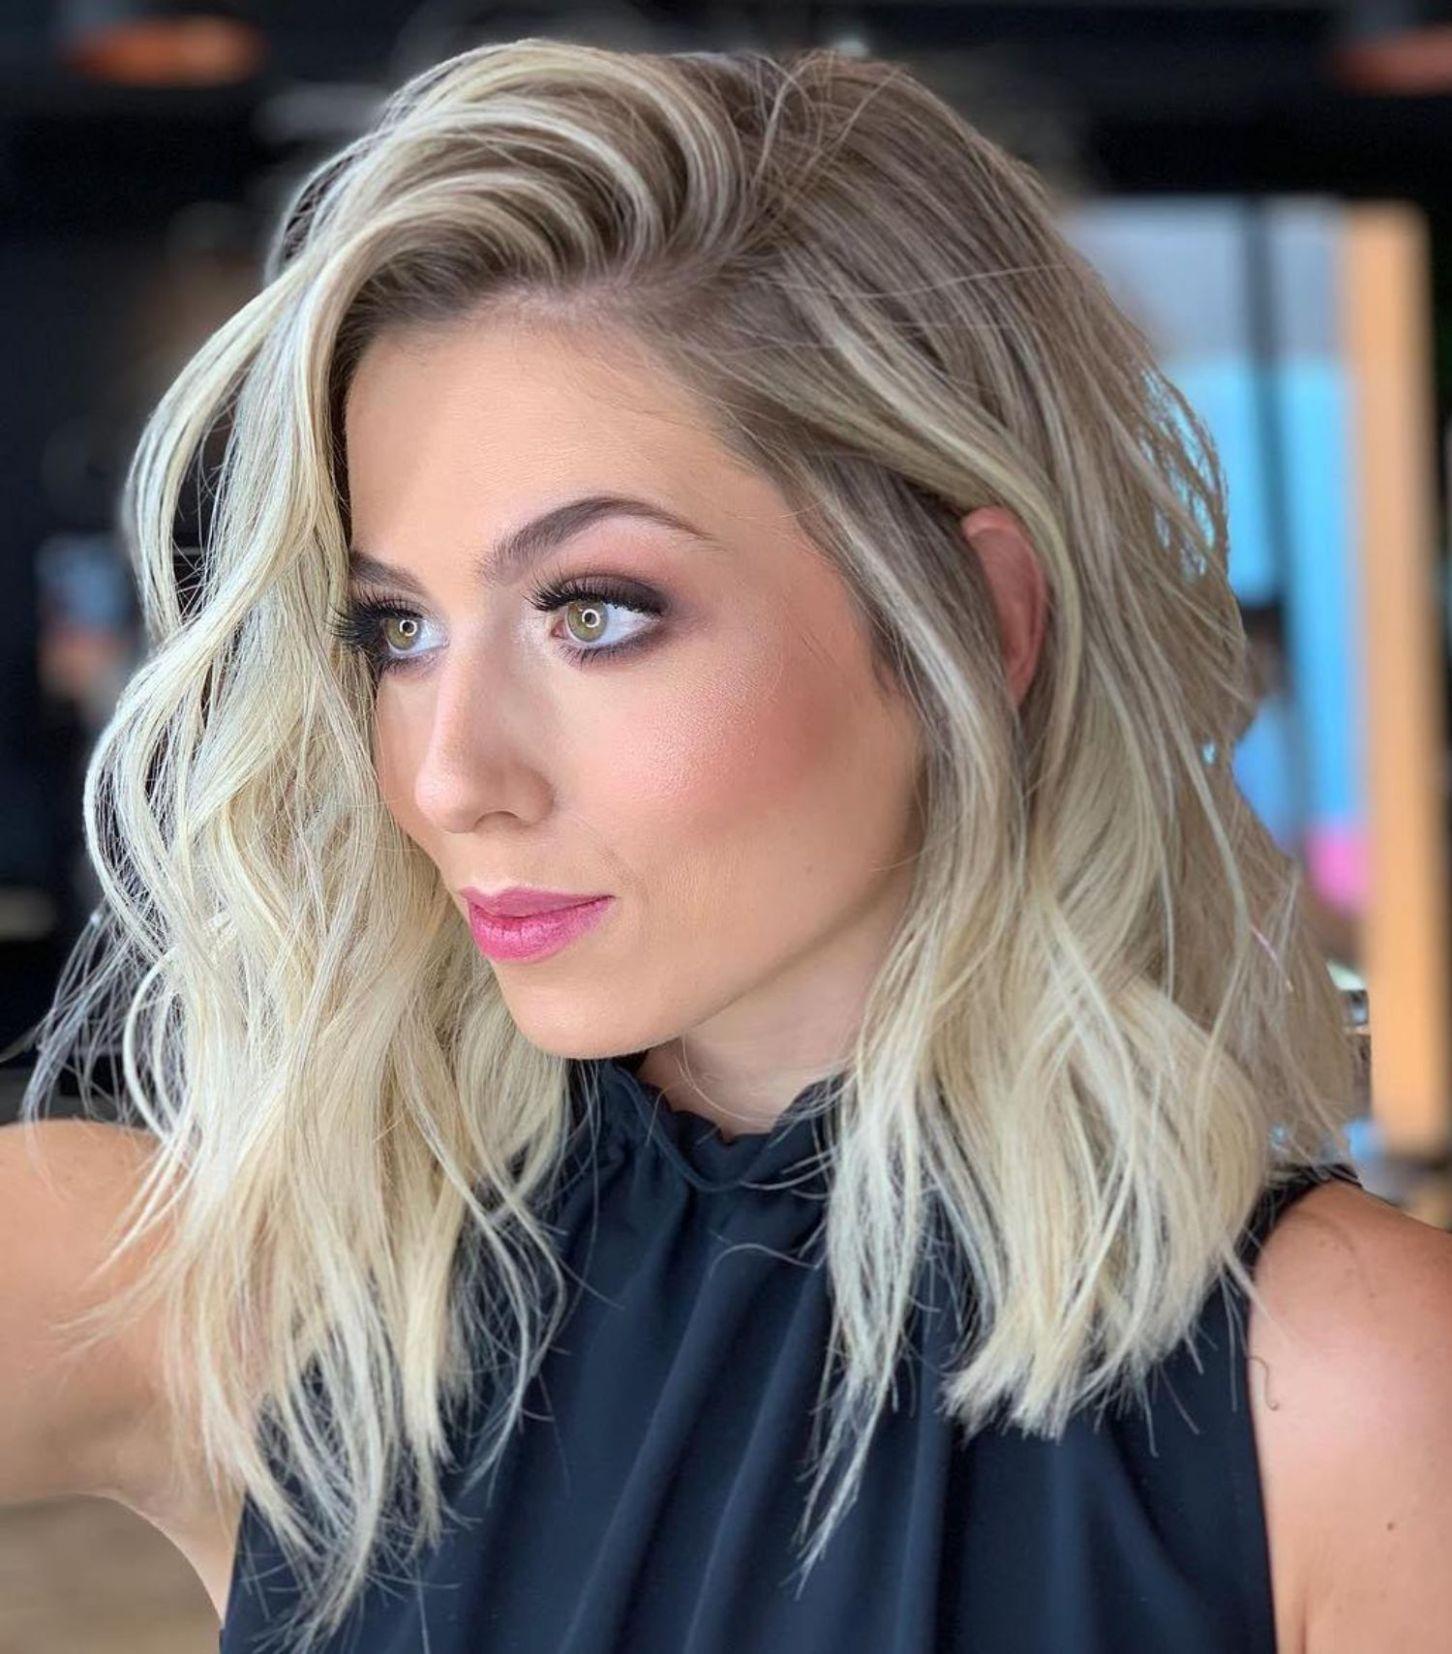 60 Fun and Flattering Medium Hairstyles for Women | Medium ...